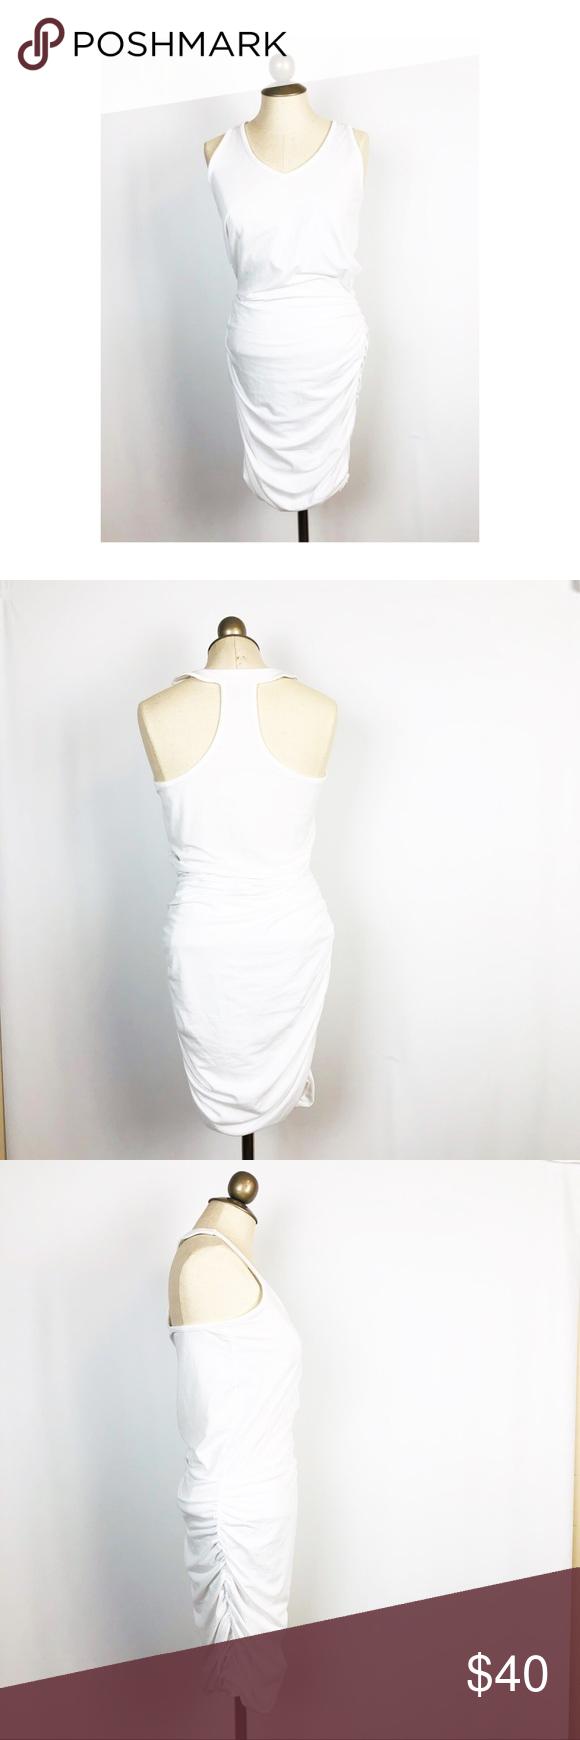 Athleta White Racerback Gathered Active Dress Athleta Active Stretch White Racerback V Neck Dress Soft And Stretchy Enough For Dresses Daytime Dresses Athleta [ 1740 x 580 Pixel ]